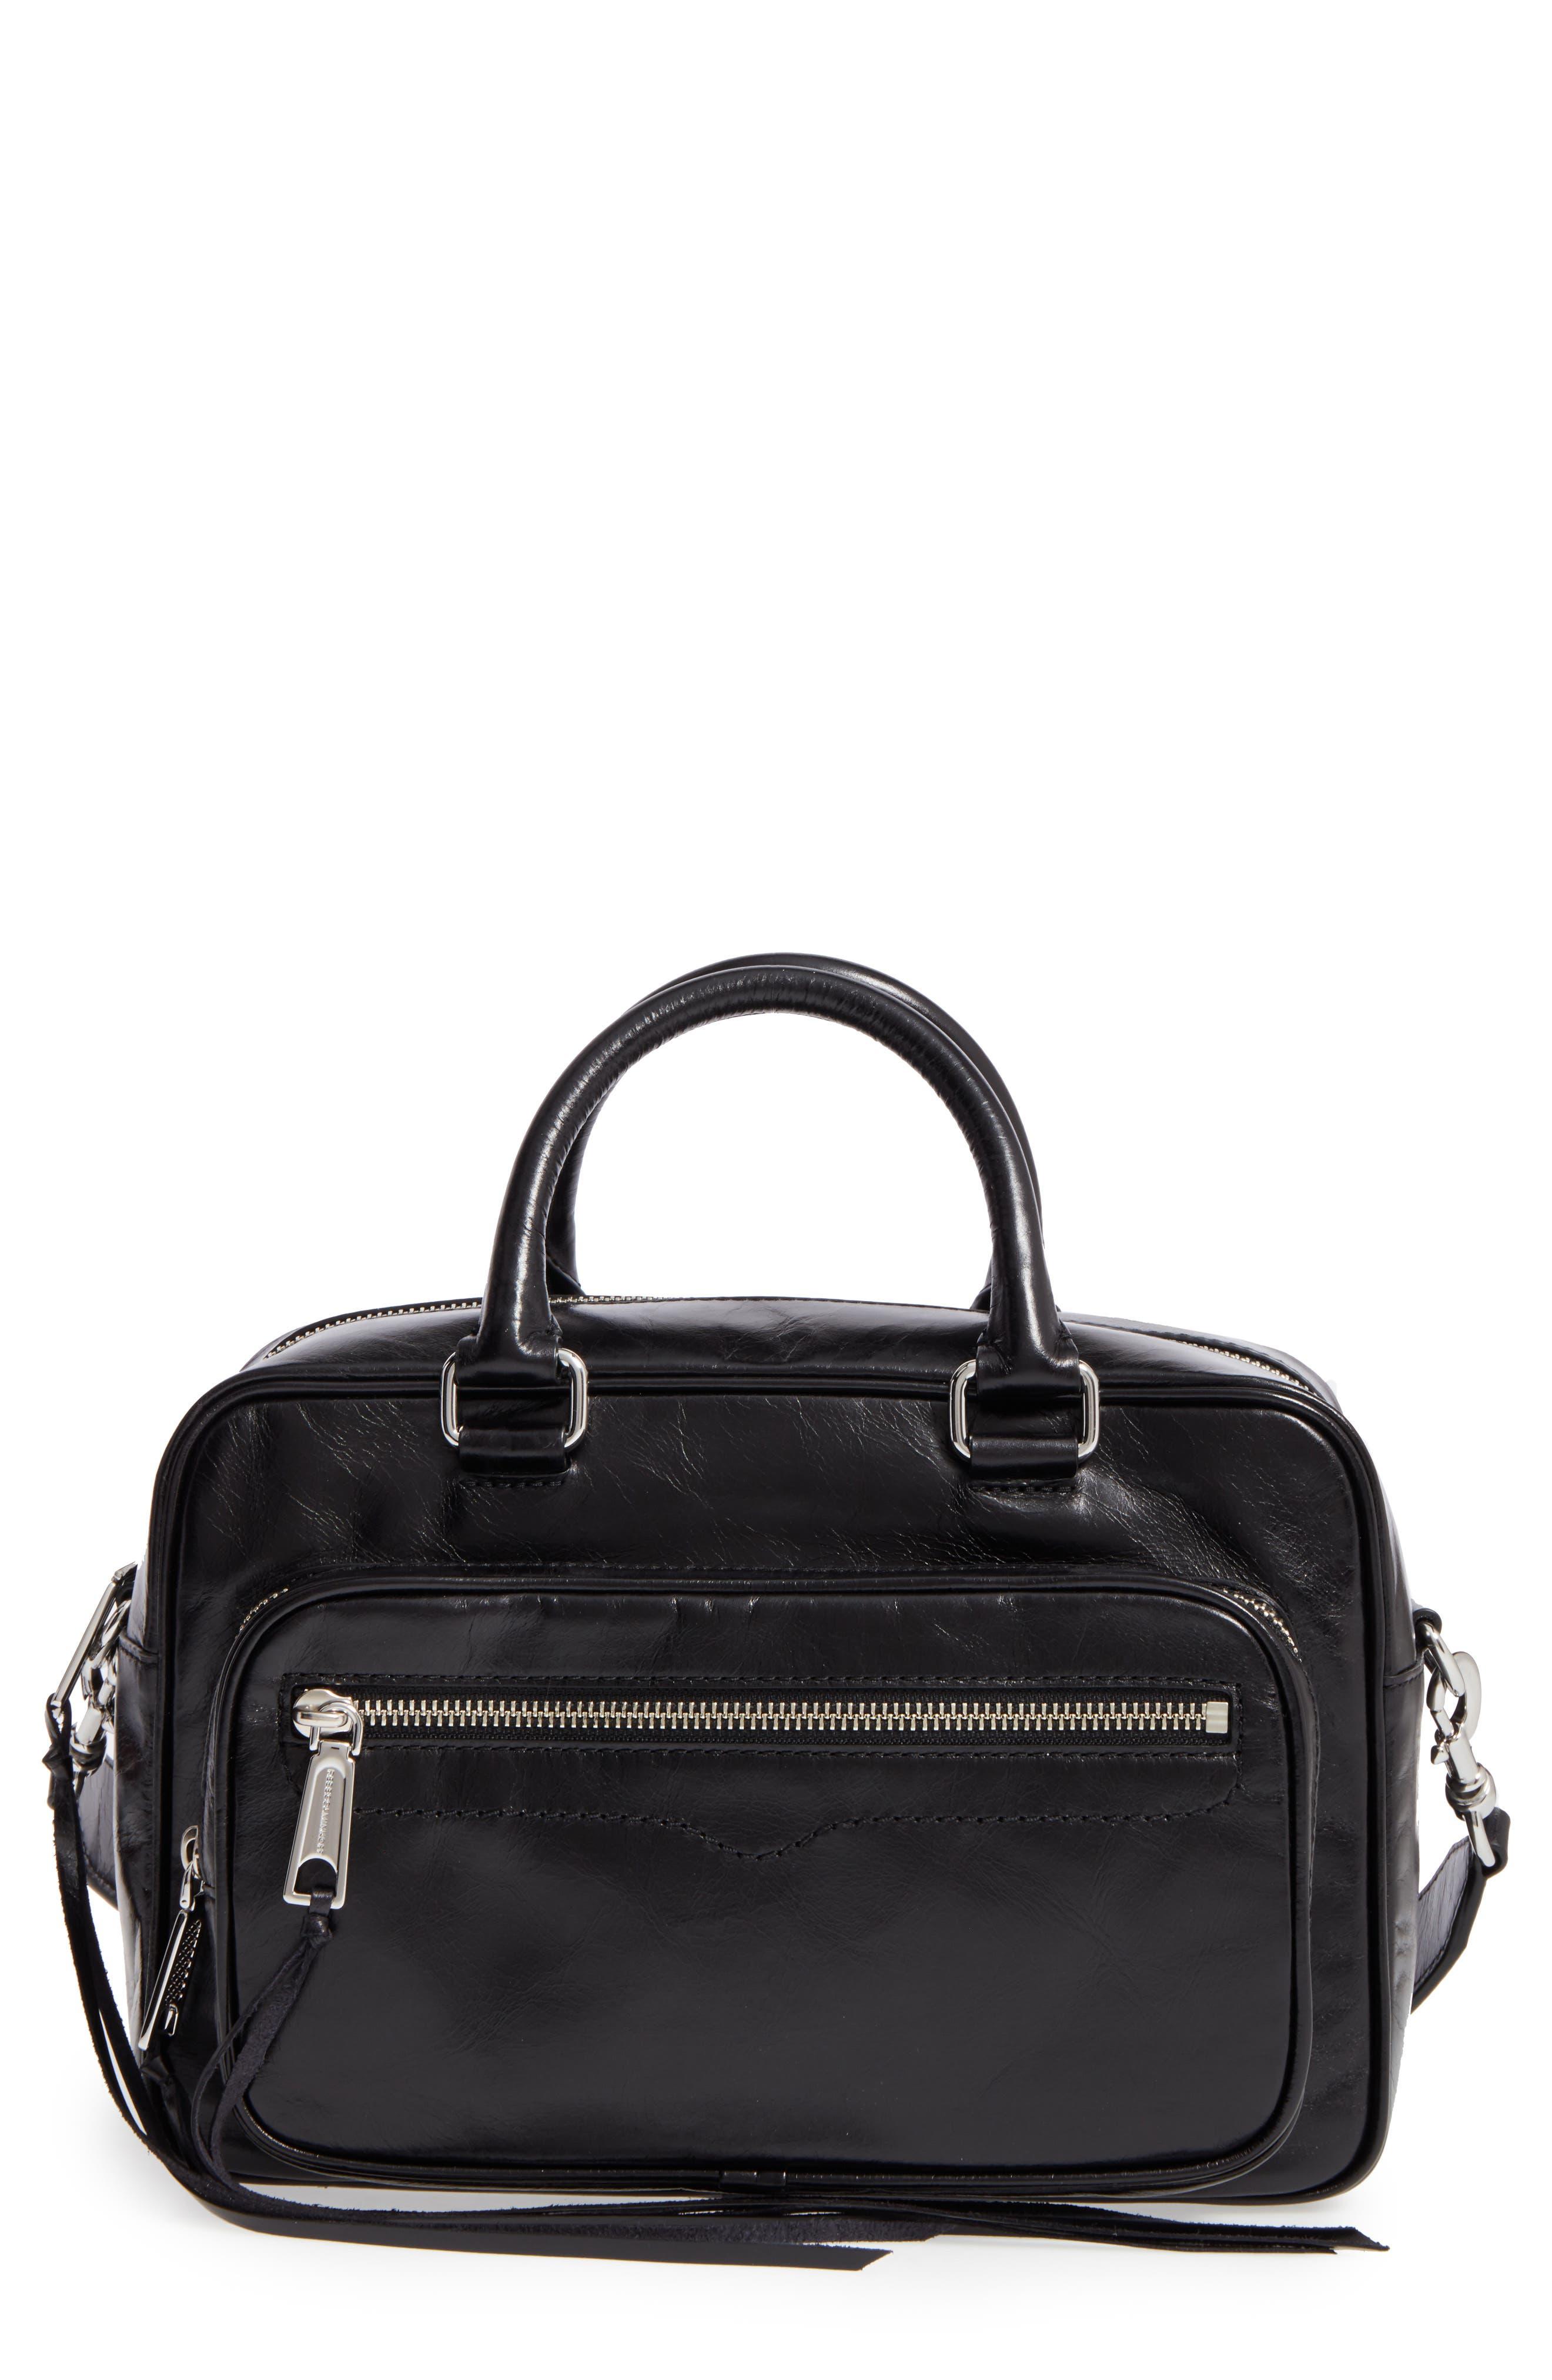 Rebecca Minkoff Solstice Leather Crossbody Duffel Bag